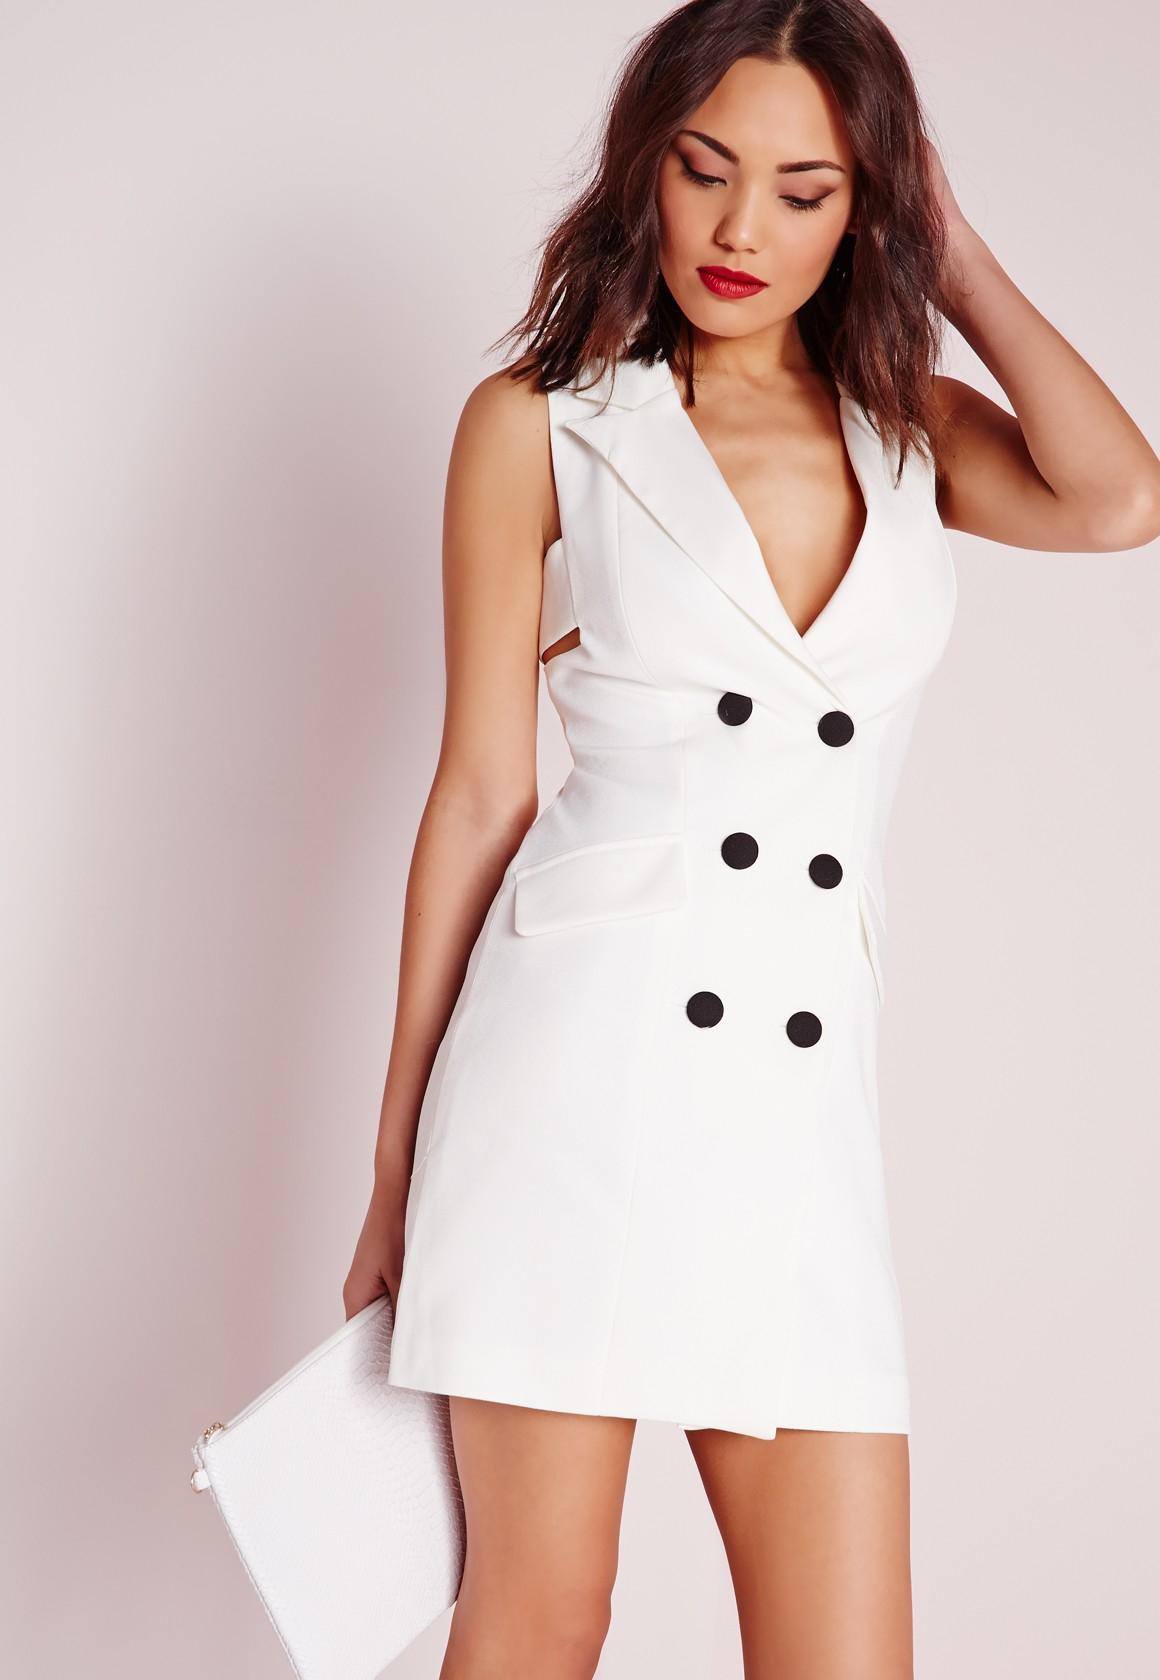 Lyst Missguided Crepe Sleeveless Blazer Dress White In White